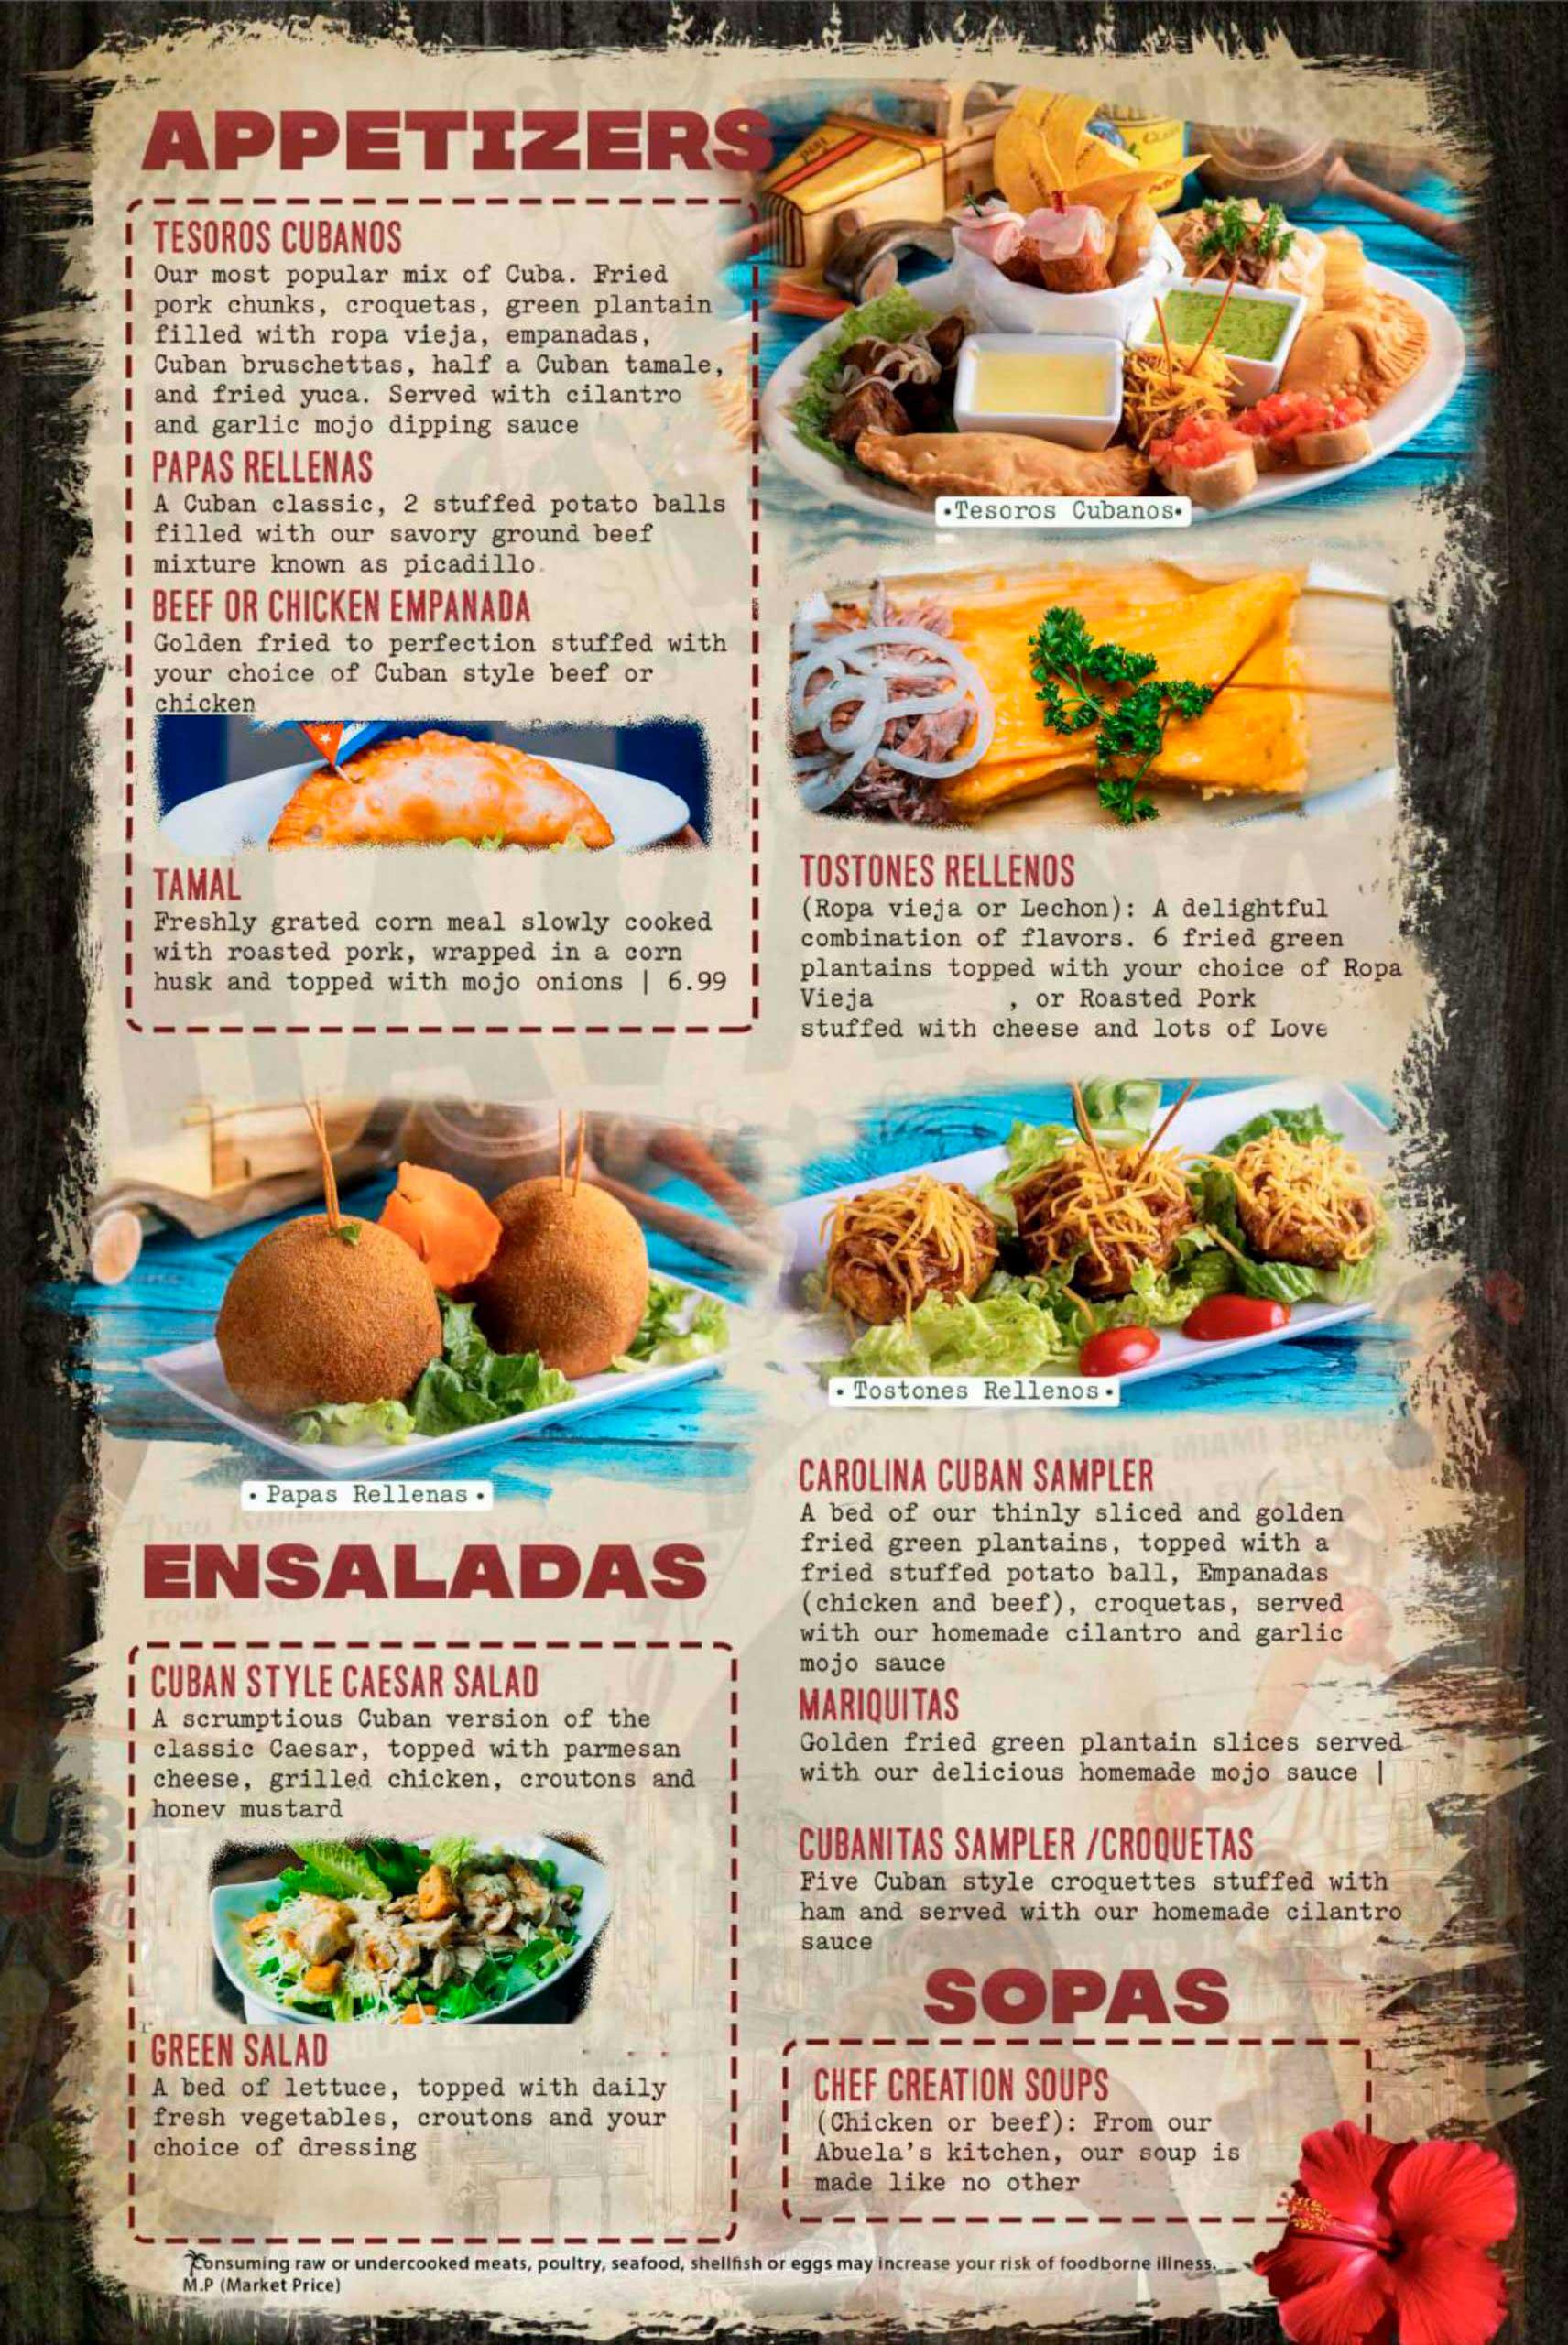 appe_menu